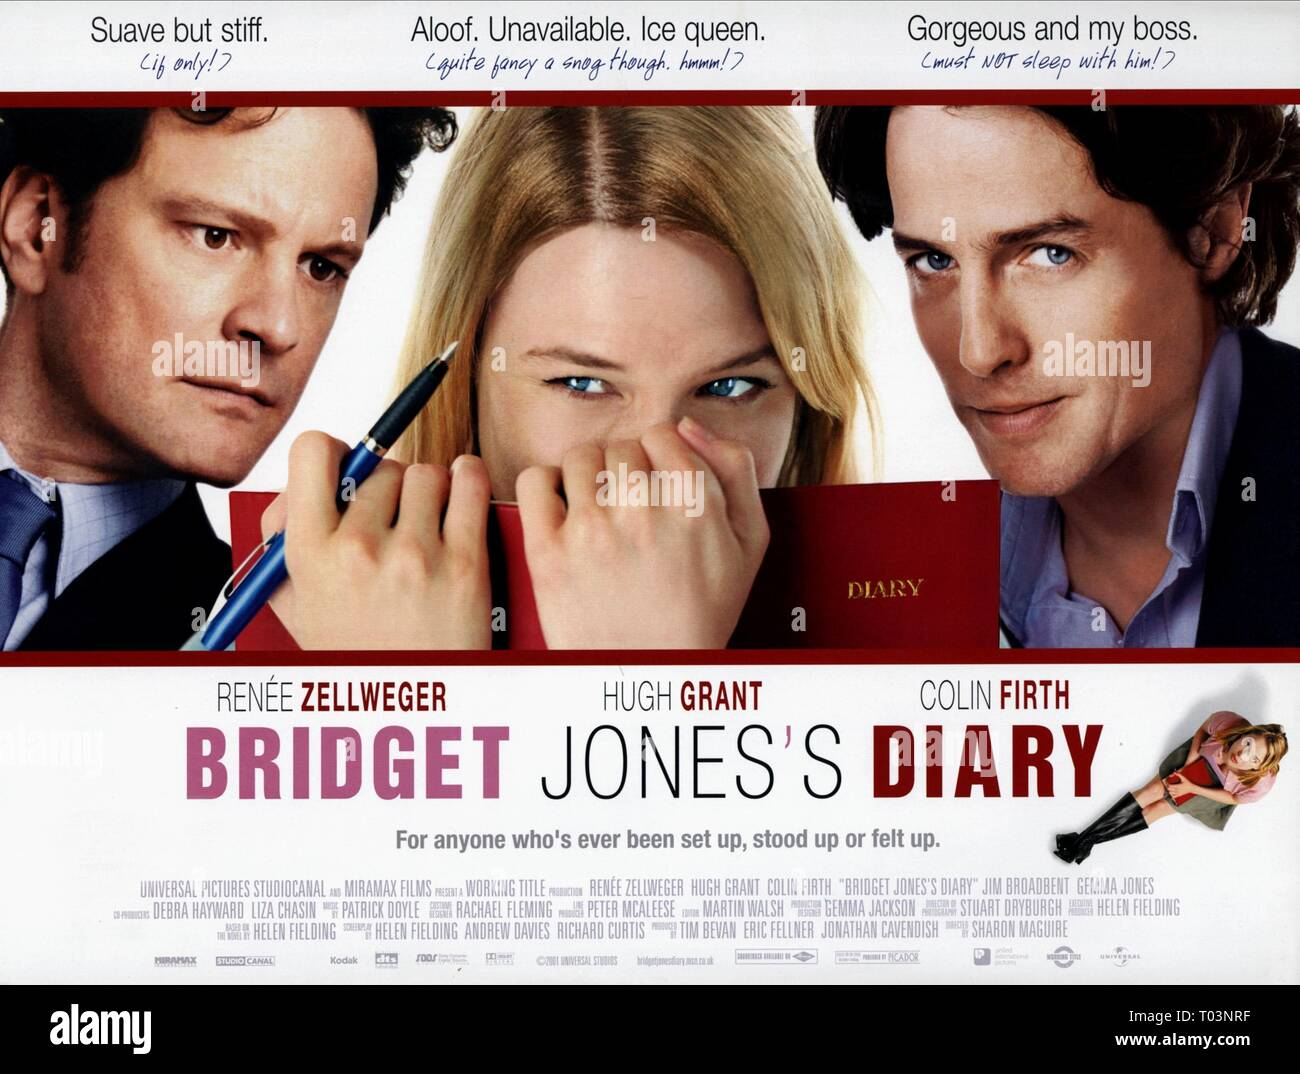 Bridget Jones Diary Movie Poster Film Photo Print Picture Renée Zellwegger